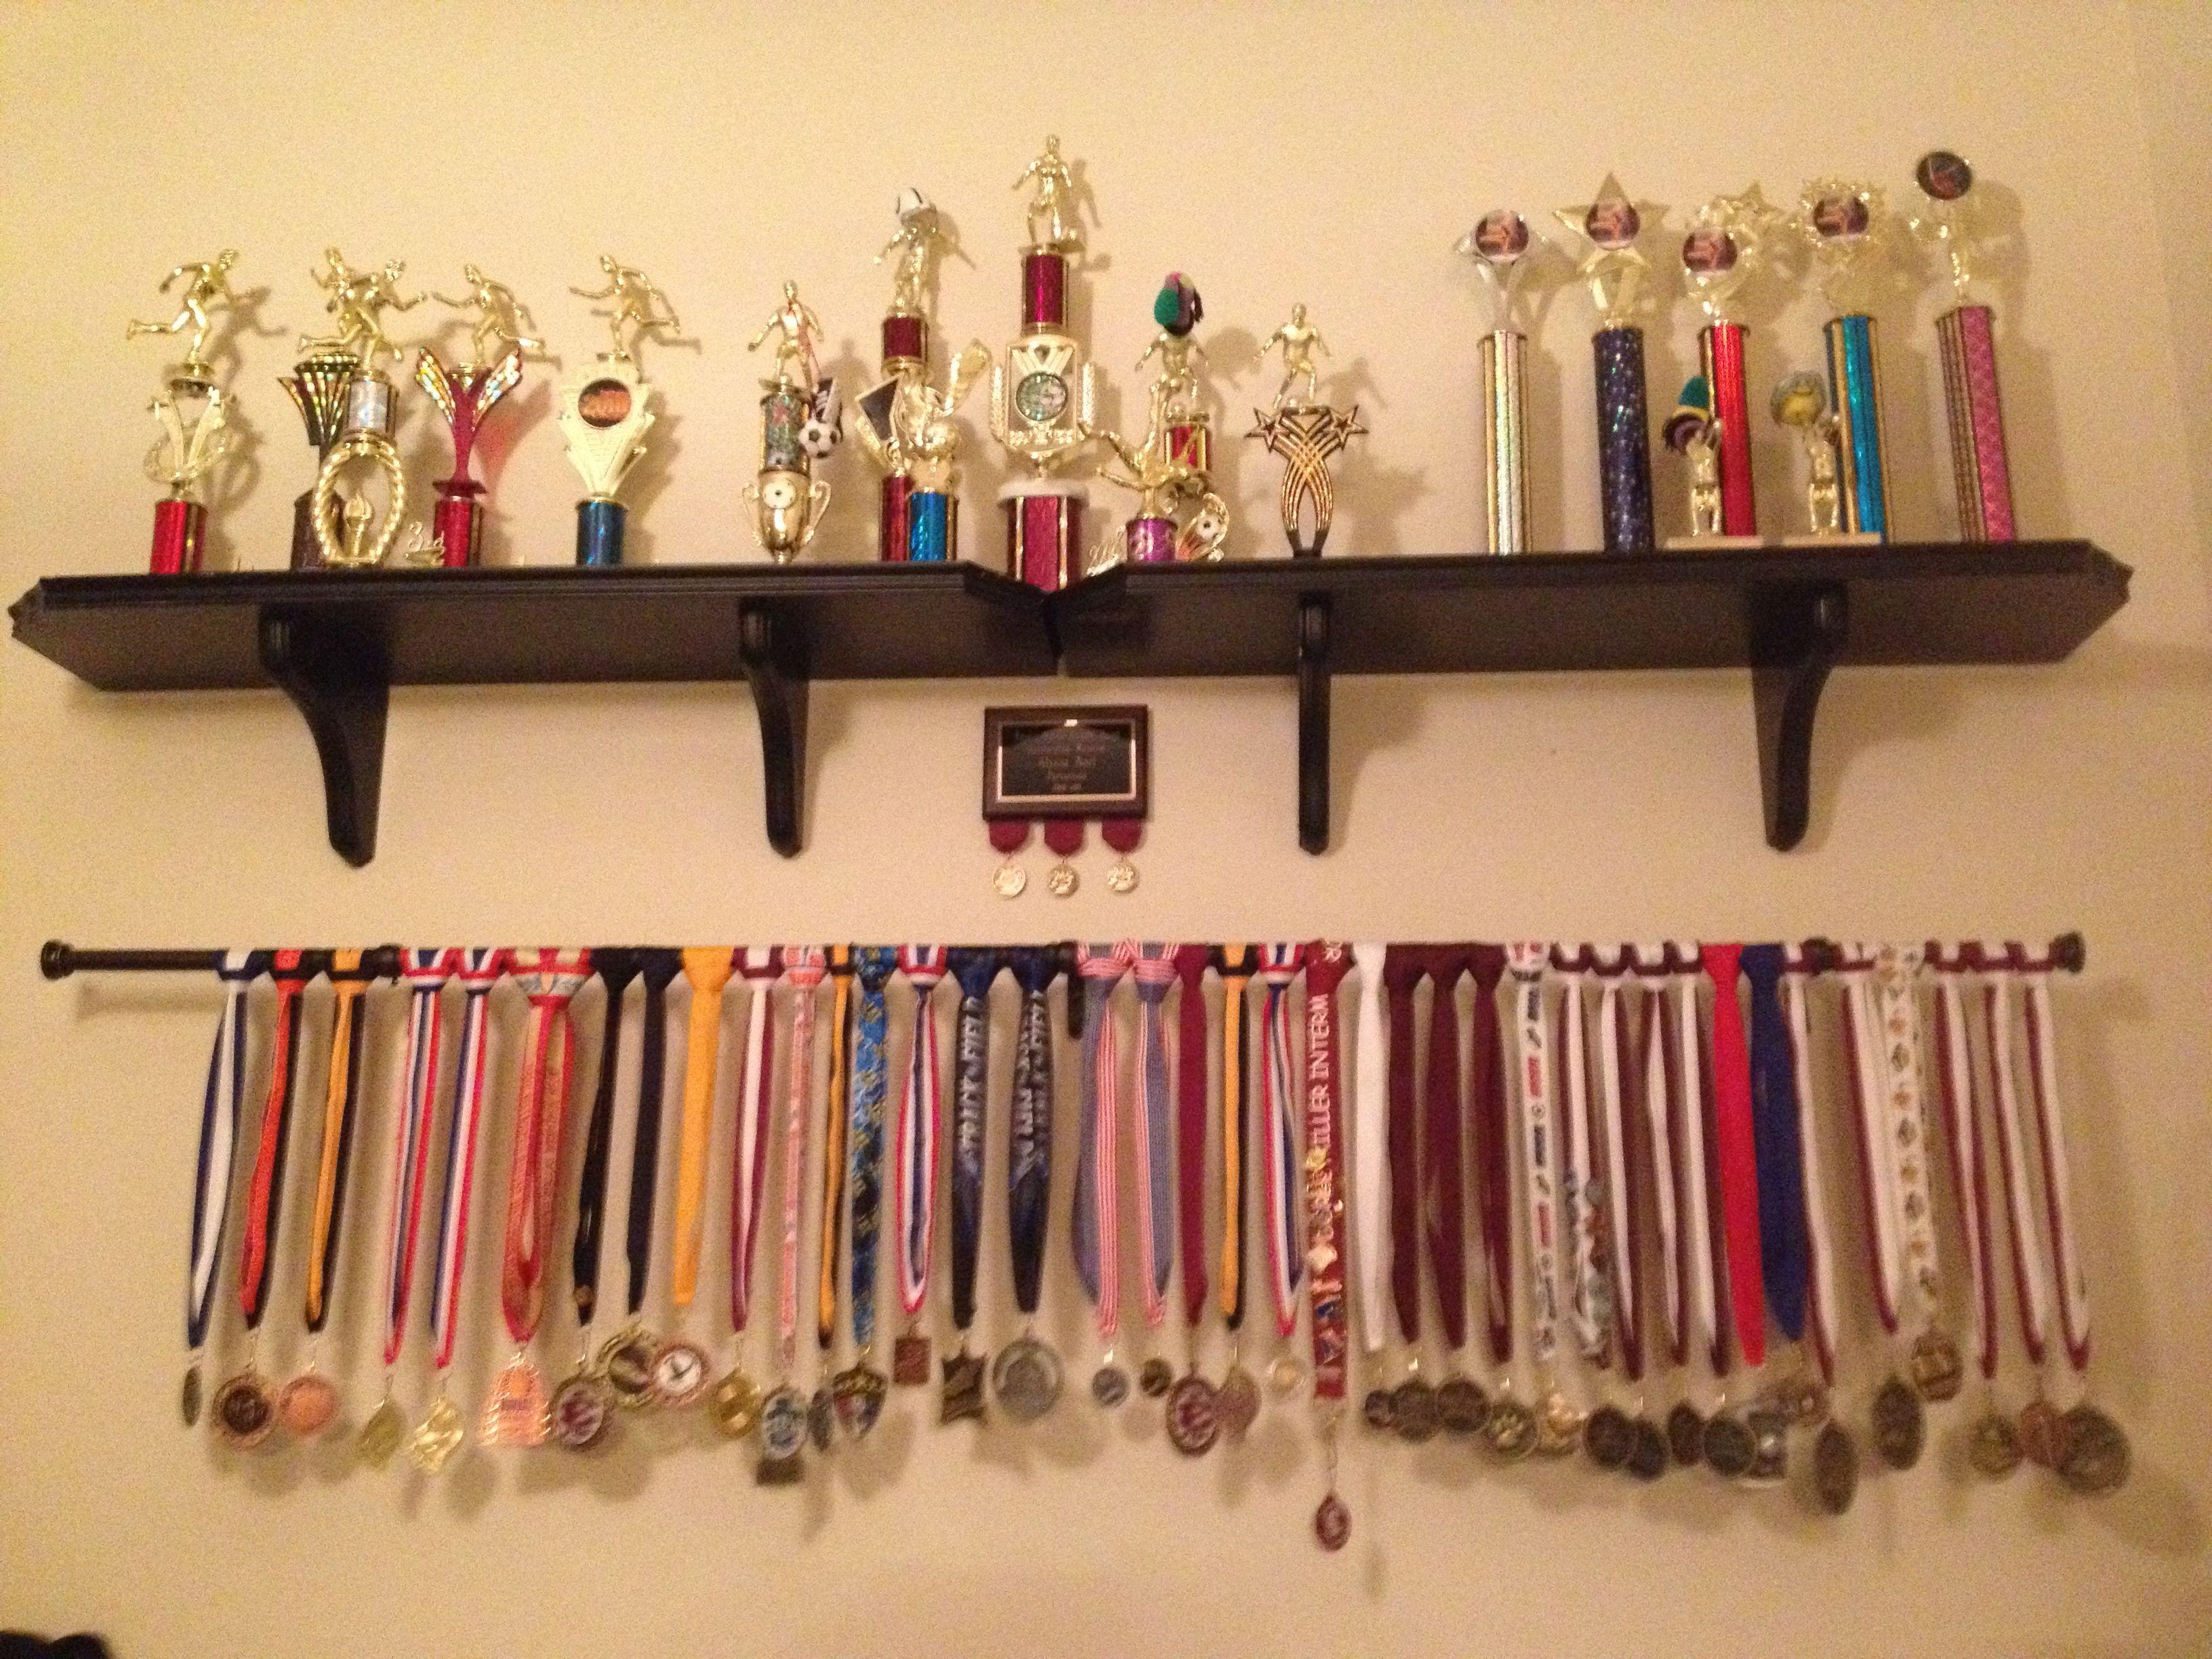 Personalised Medal Trophy Hanger Holder Display Achievement Hook Shelf Rail Rack